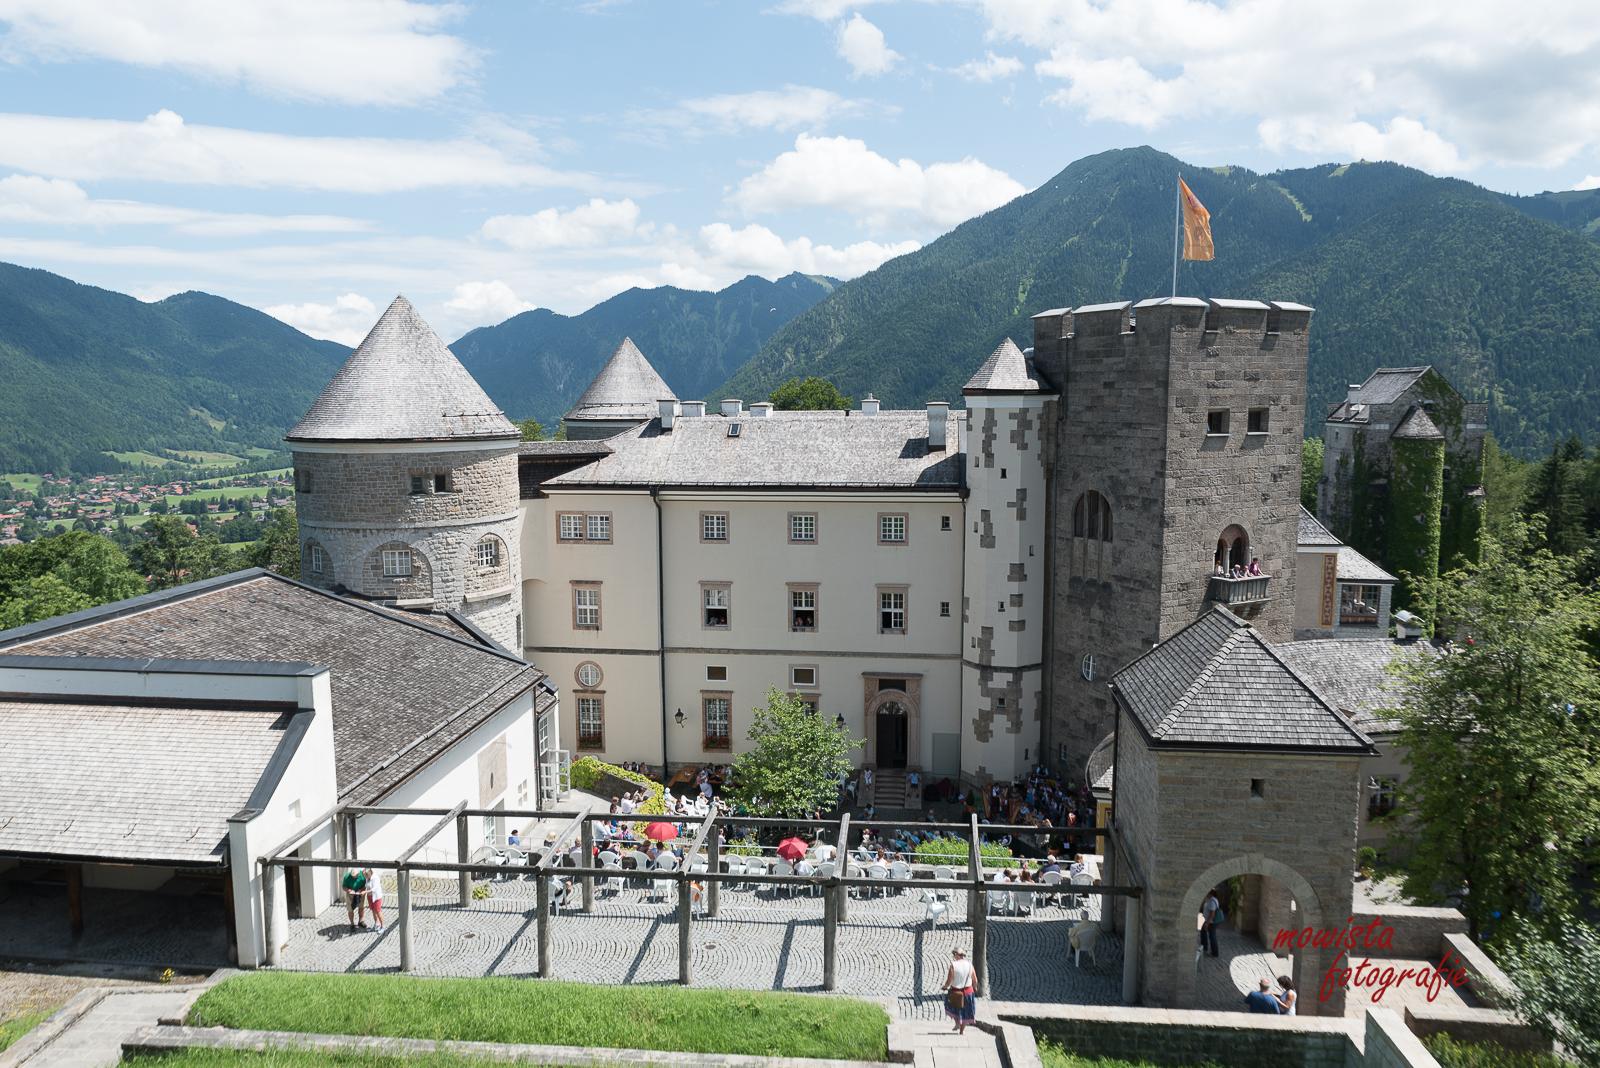 20170722_MW_DSC_5690_Schloss Ringberg